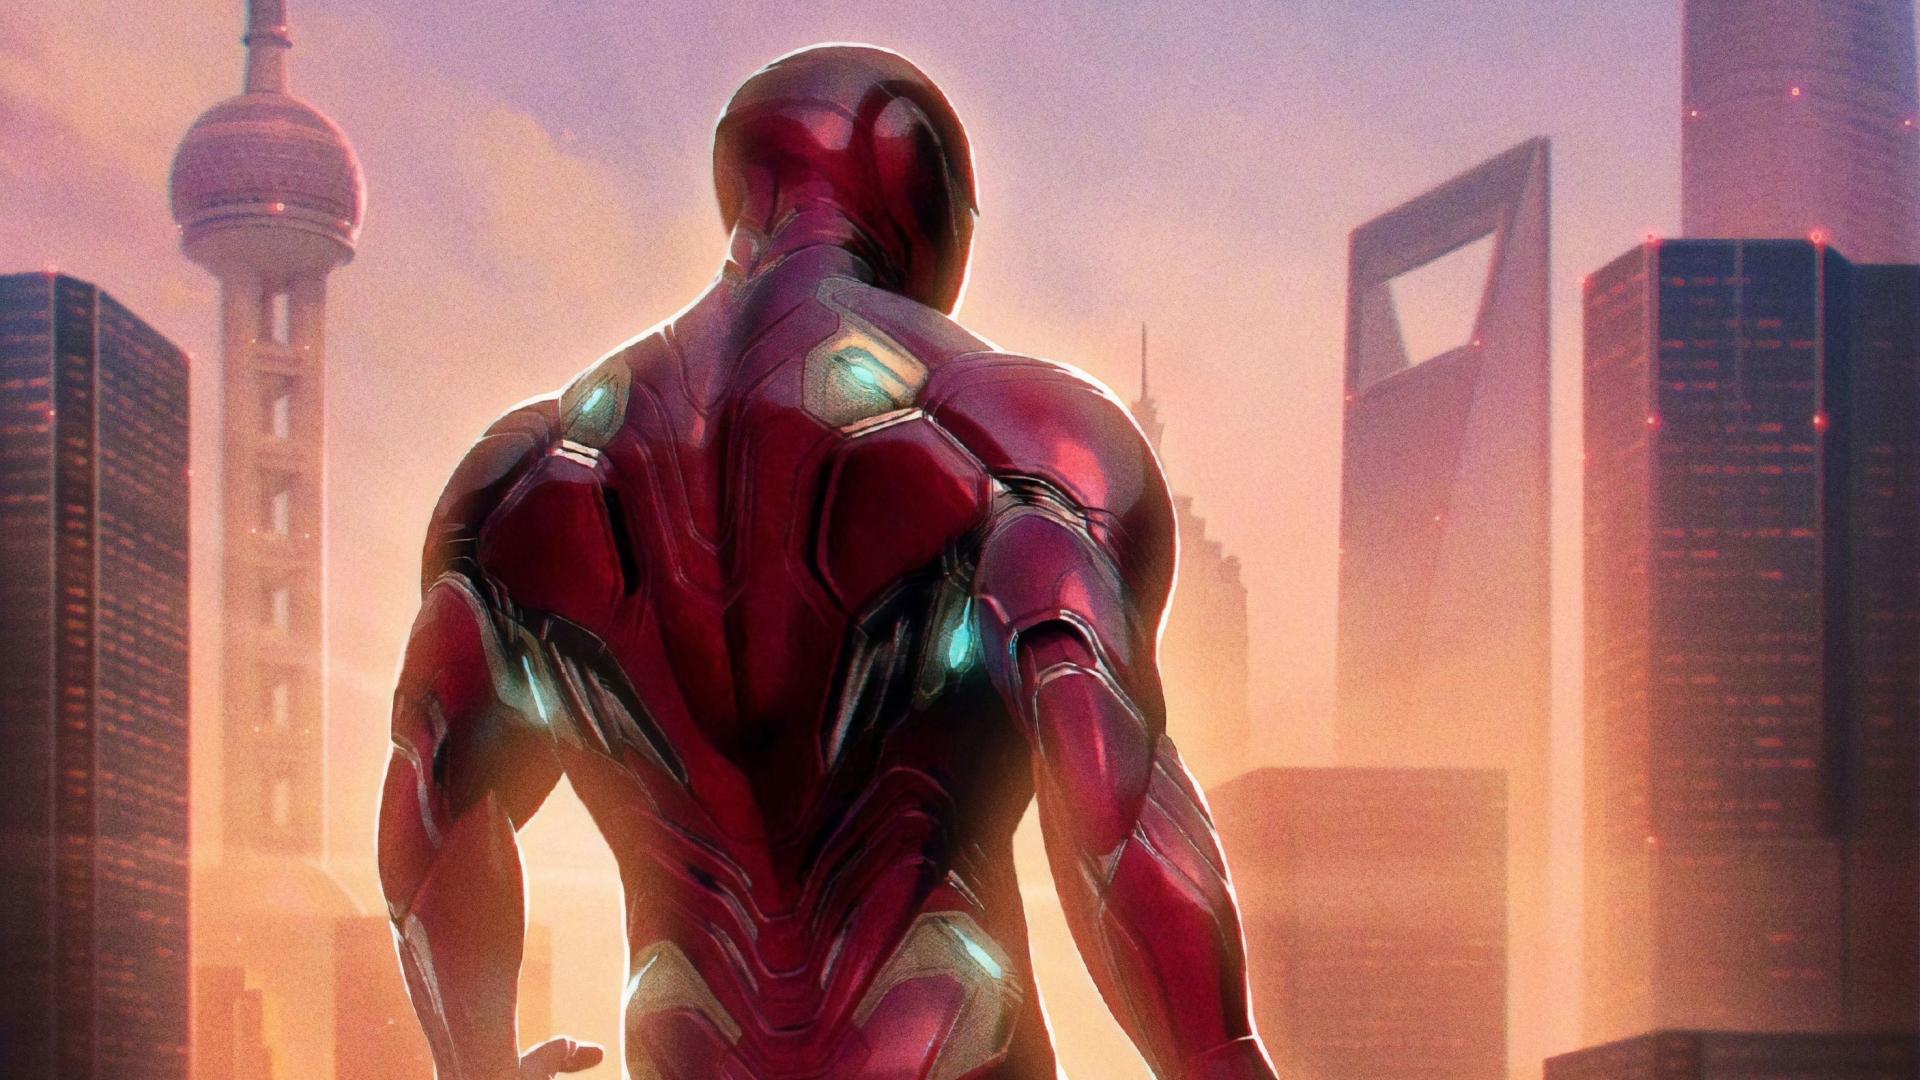 Download 1920x1080 Wallpaper Iron Man 2019 Movie Avengers